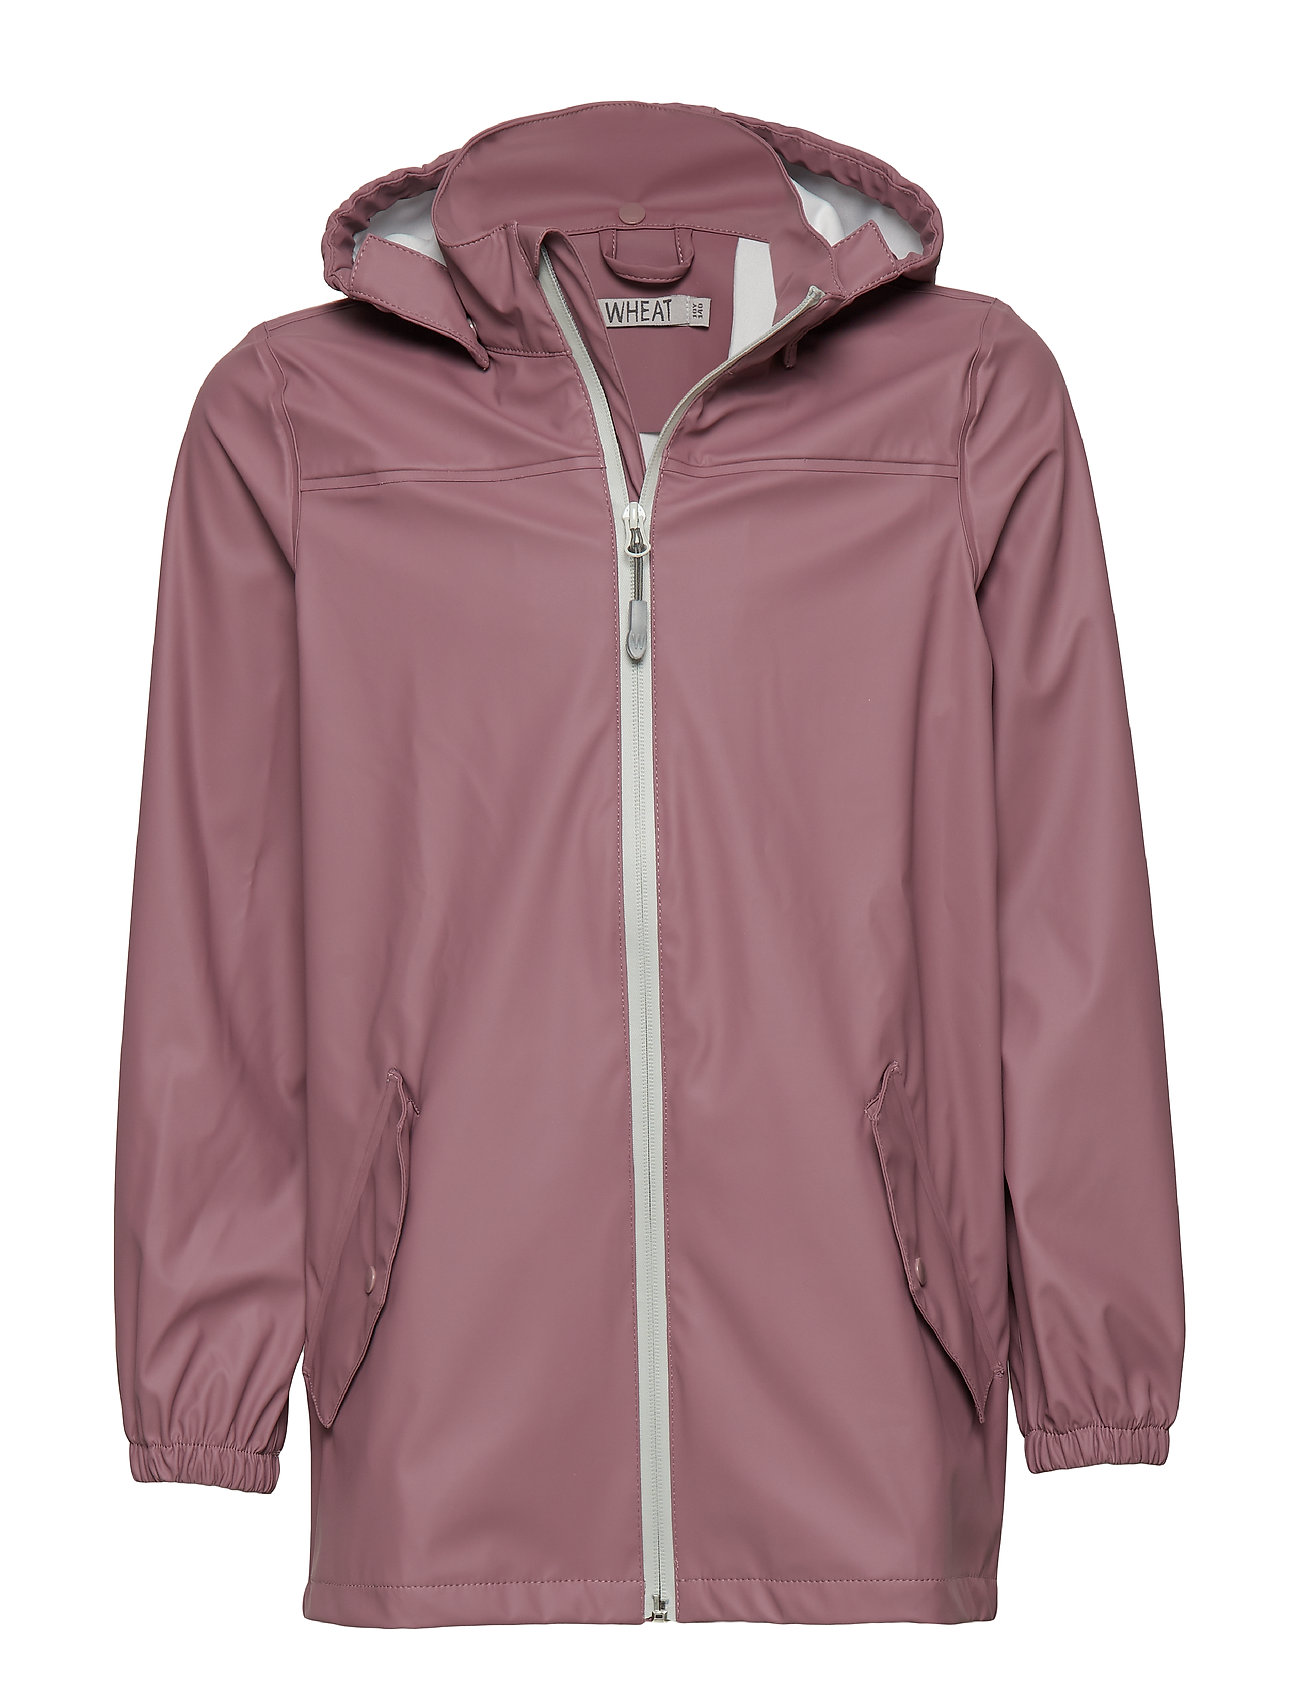 422a2df1608 Rain Coat Tex (Lavender) (£33) - Wheat - | Boozt.com